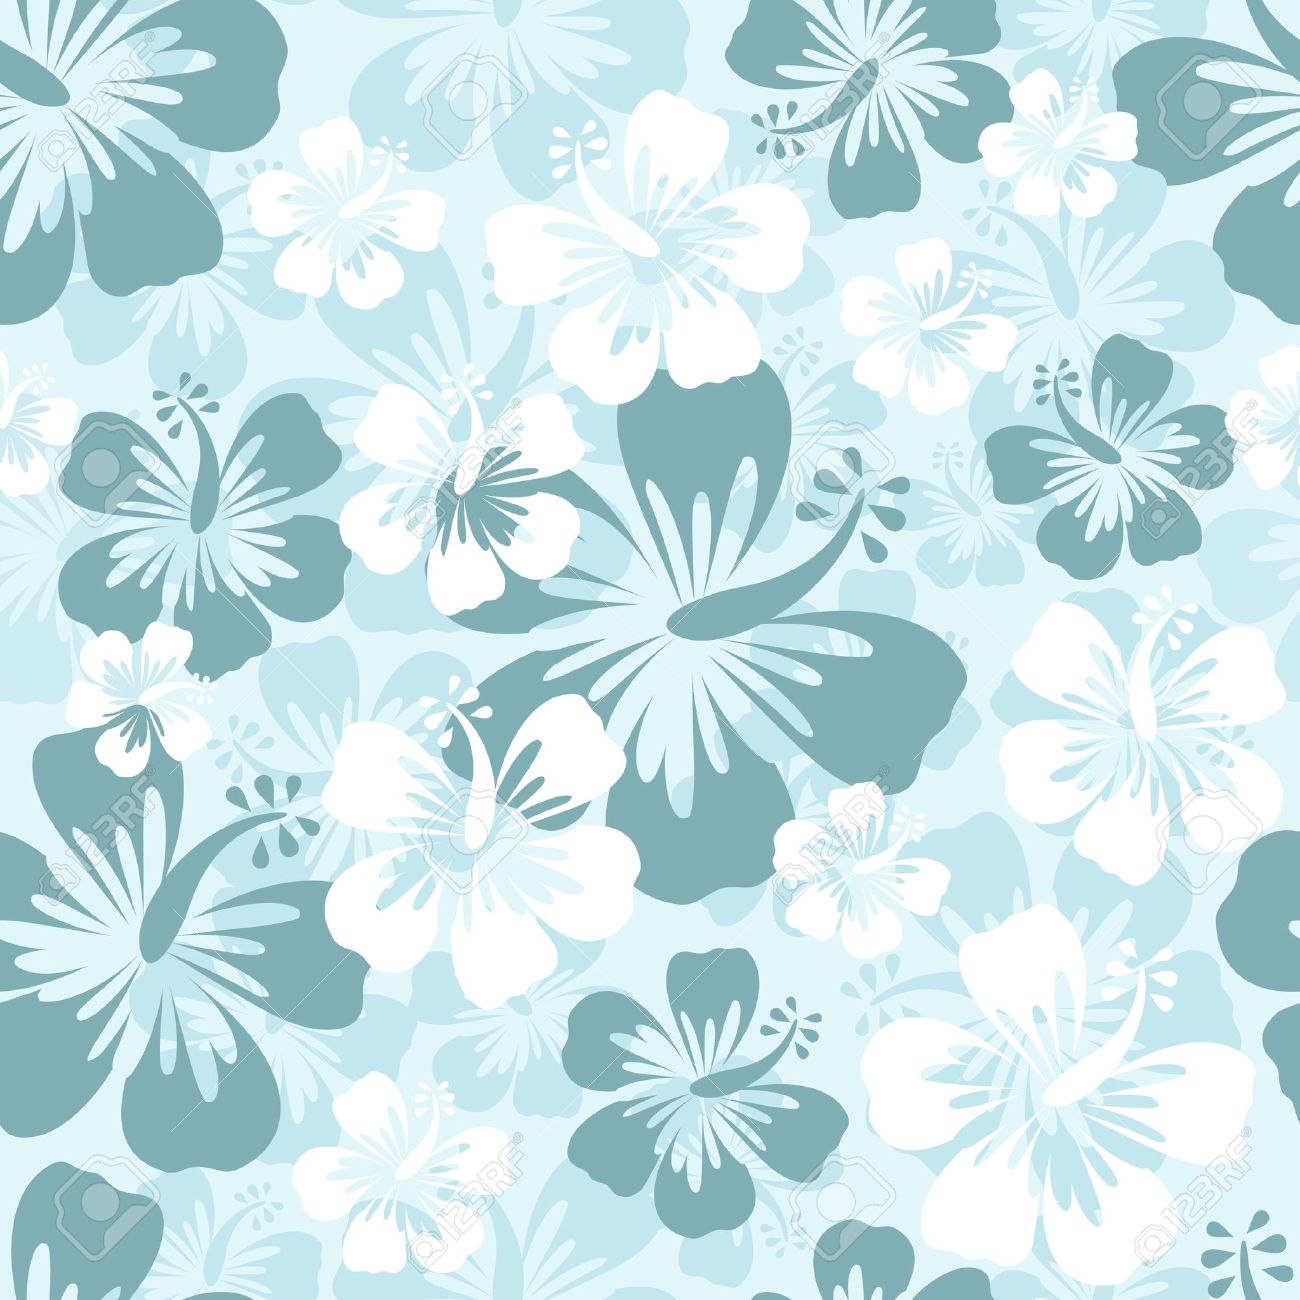 Hibiscus seamless pattern - 14054064